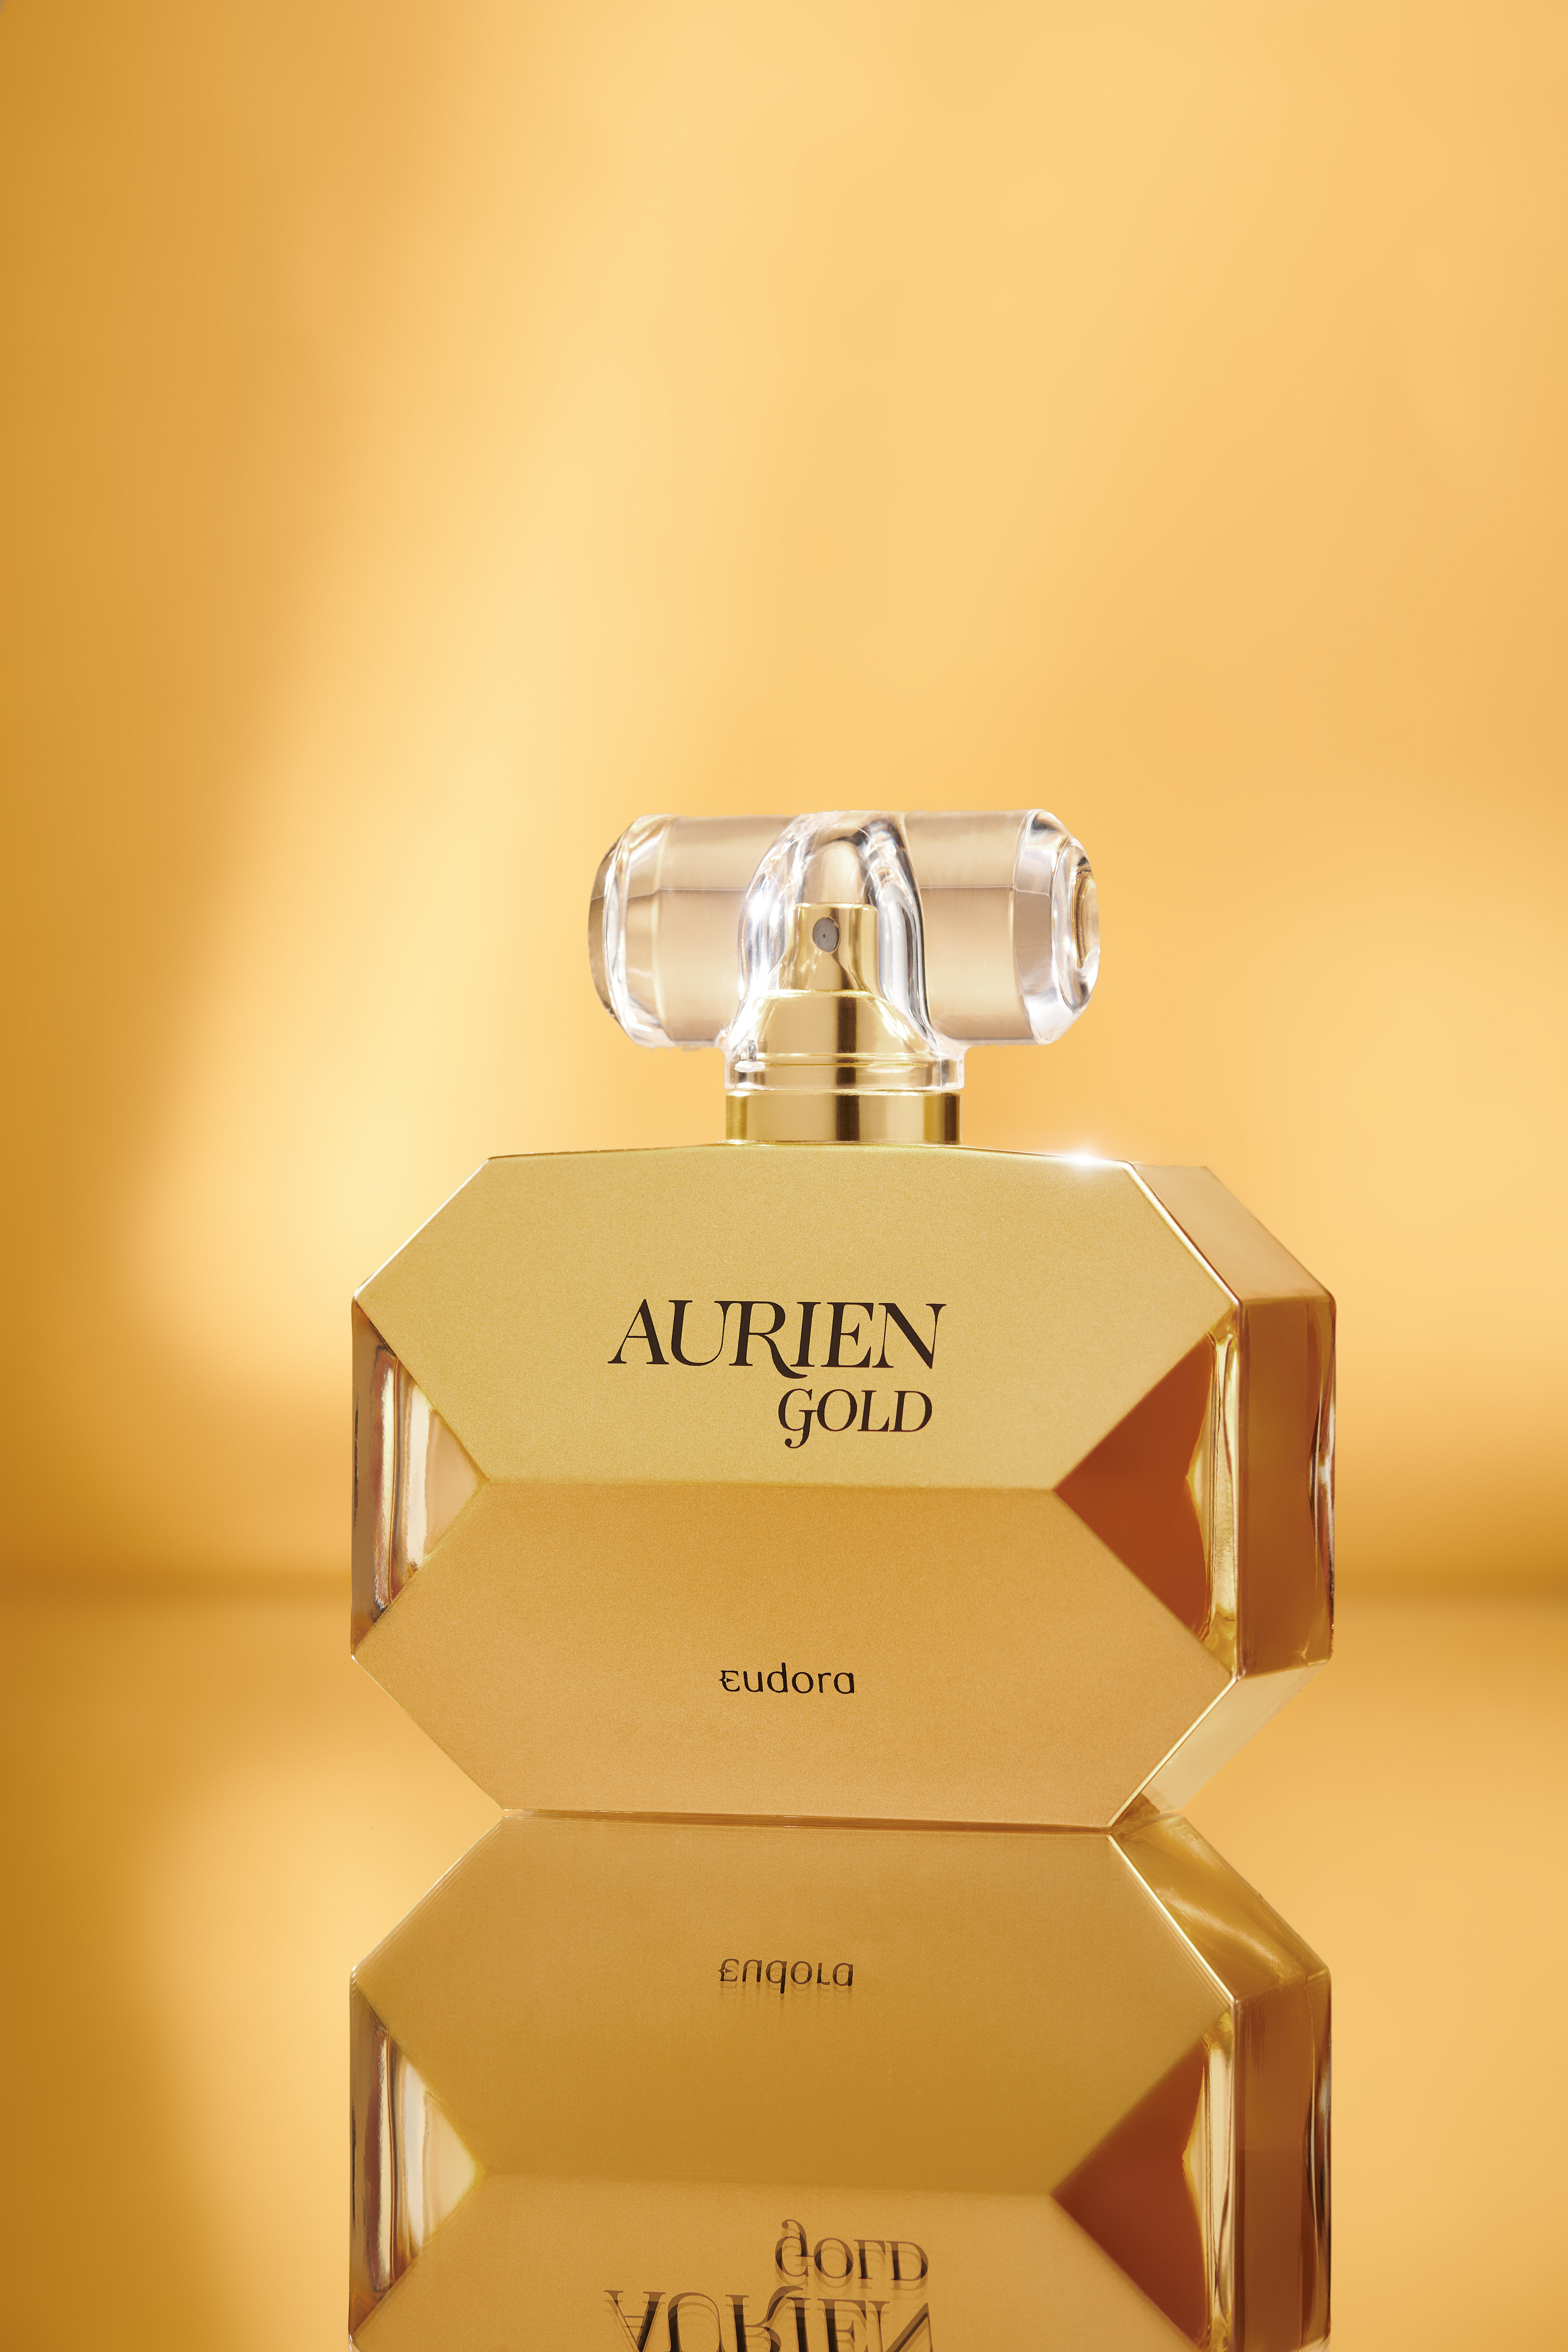 Eudora Aurien Gold